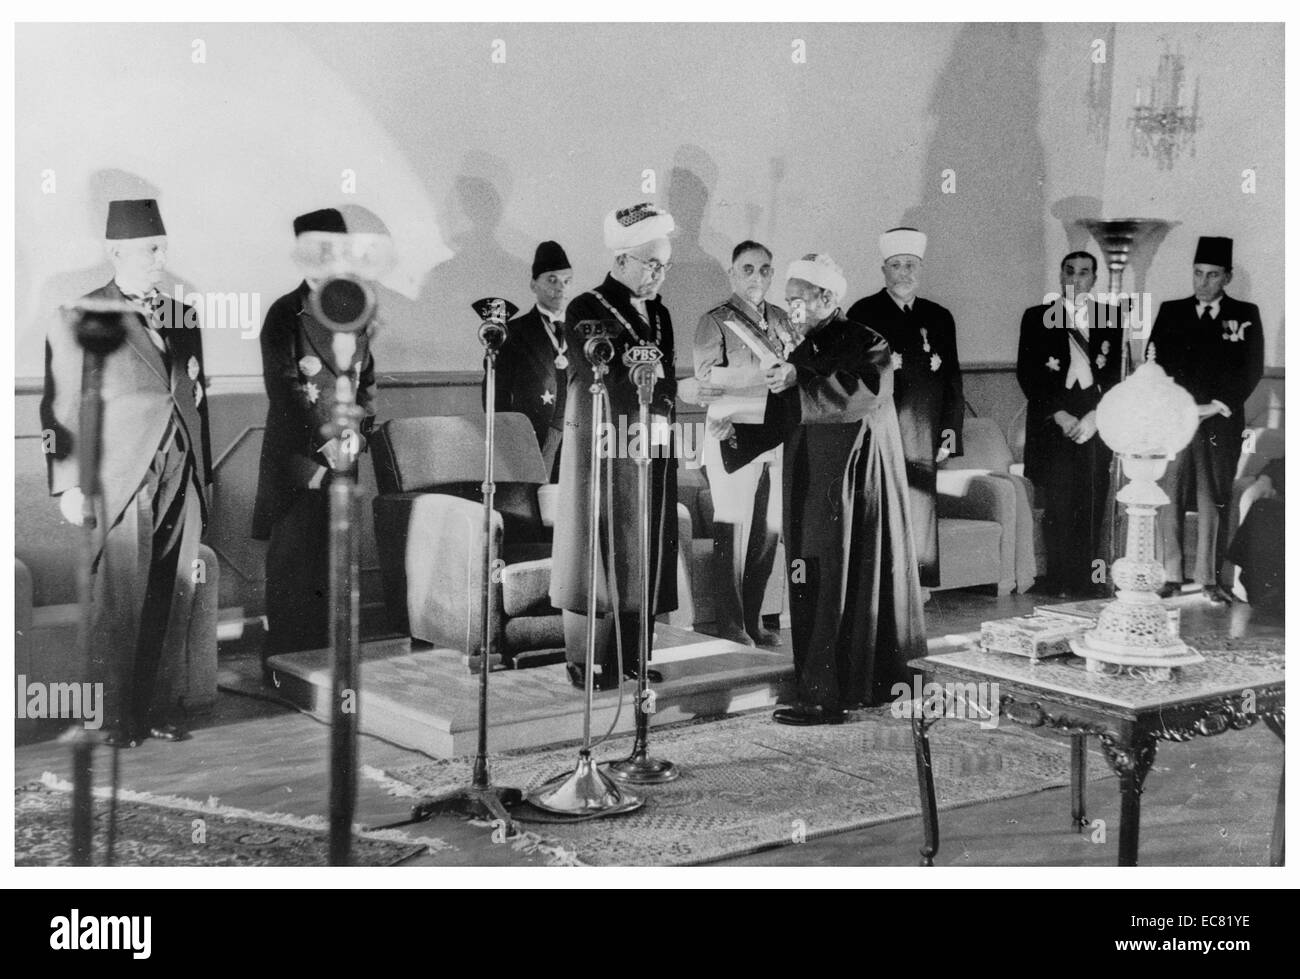 Coronation of King Abdullah of Jordan (trans-Jordan); in Amman on May 25, 1946 - Stock Image